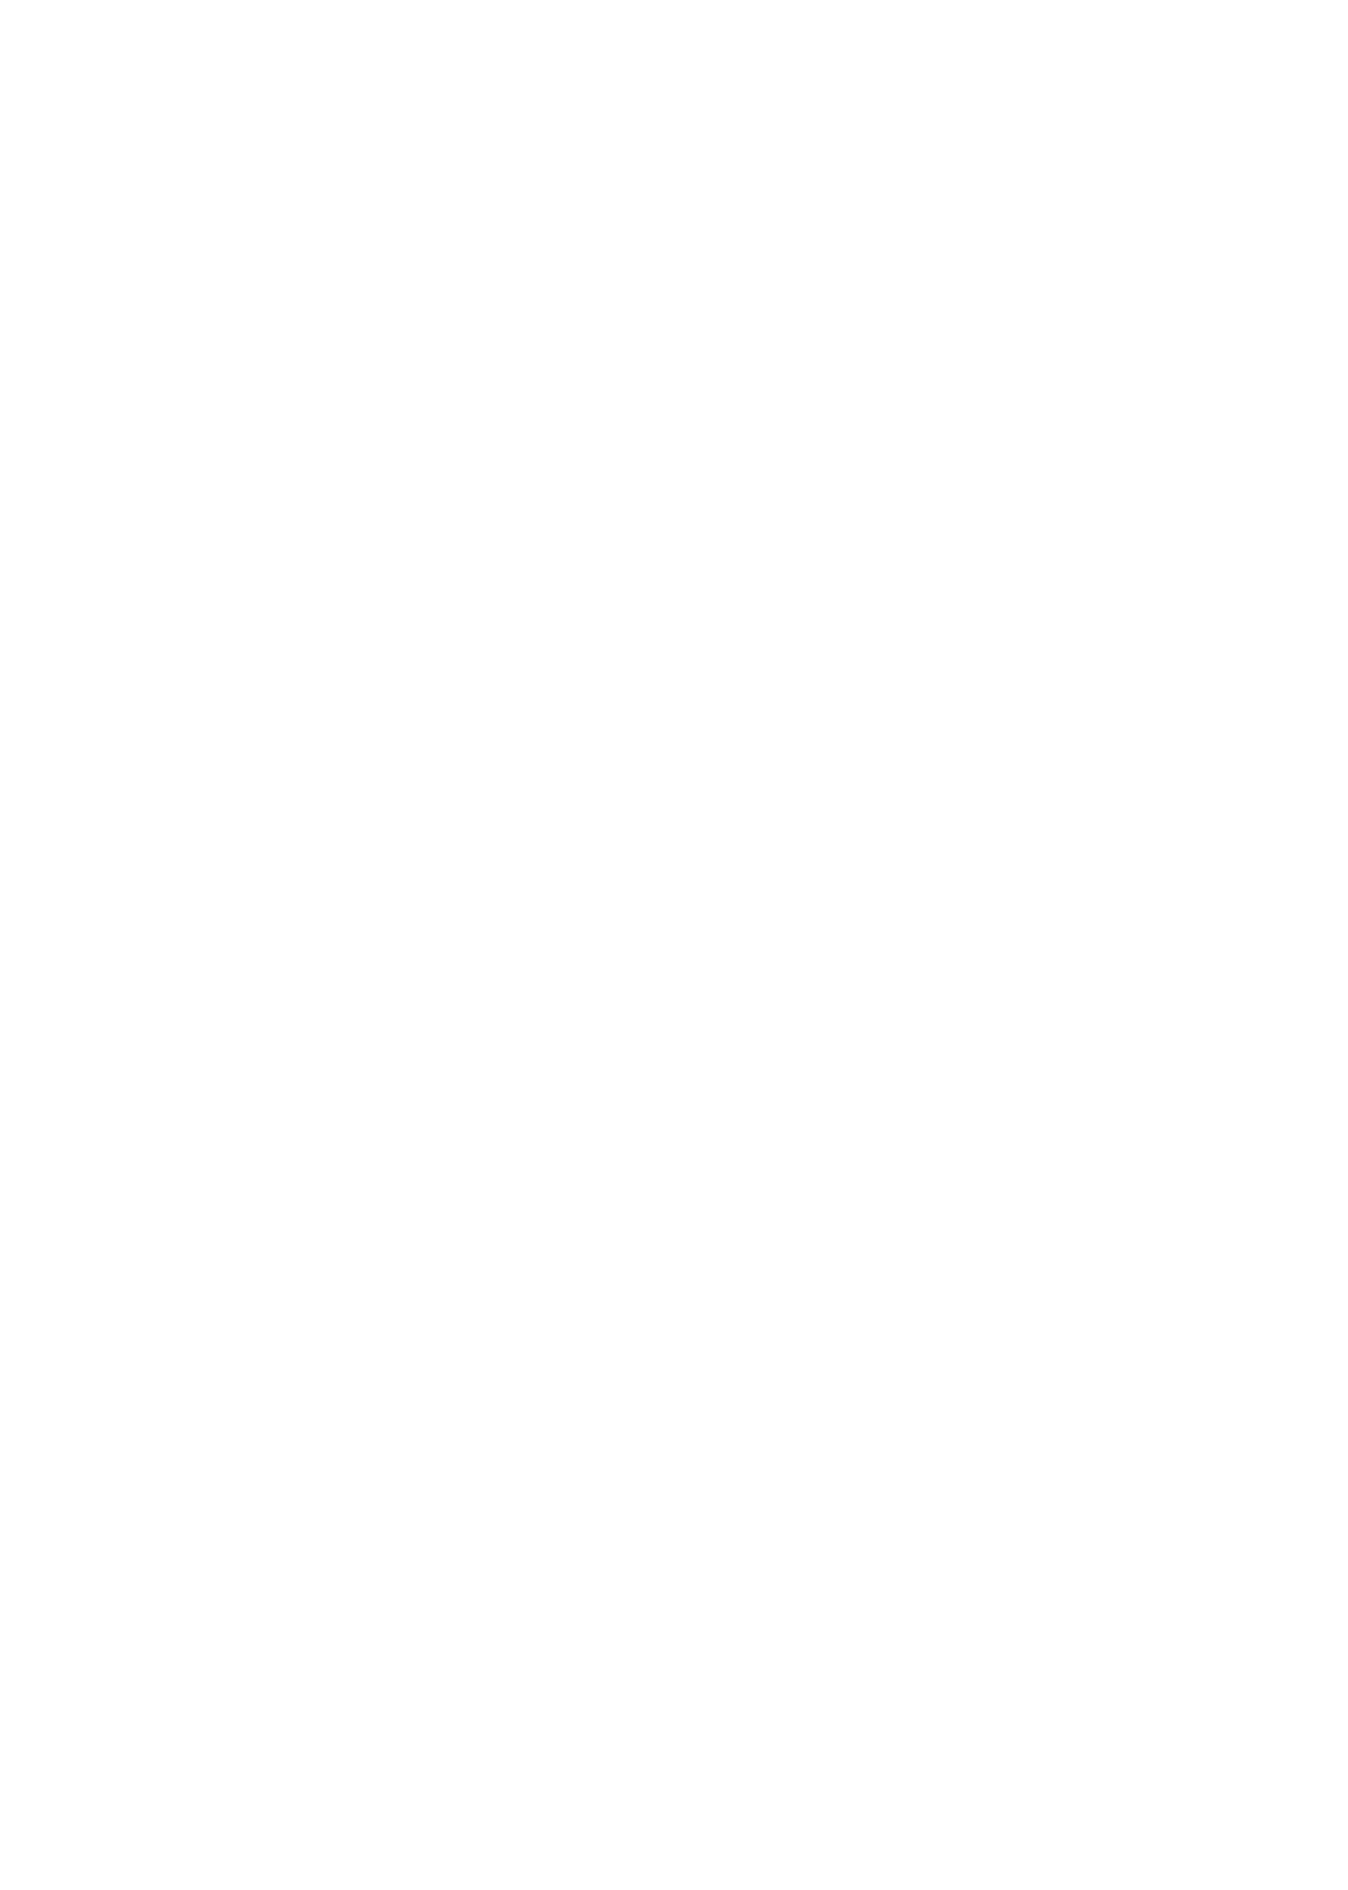 Anthemis 1 900mm x 600mm